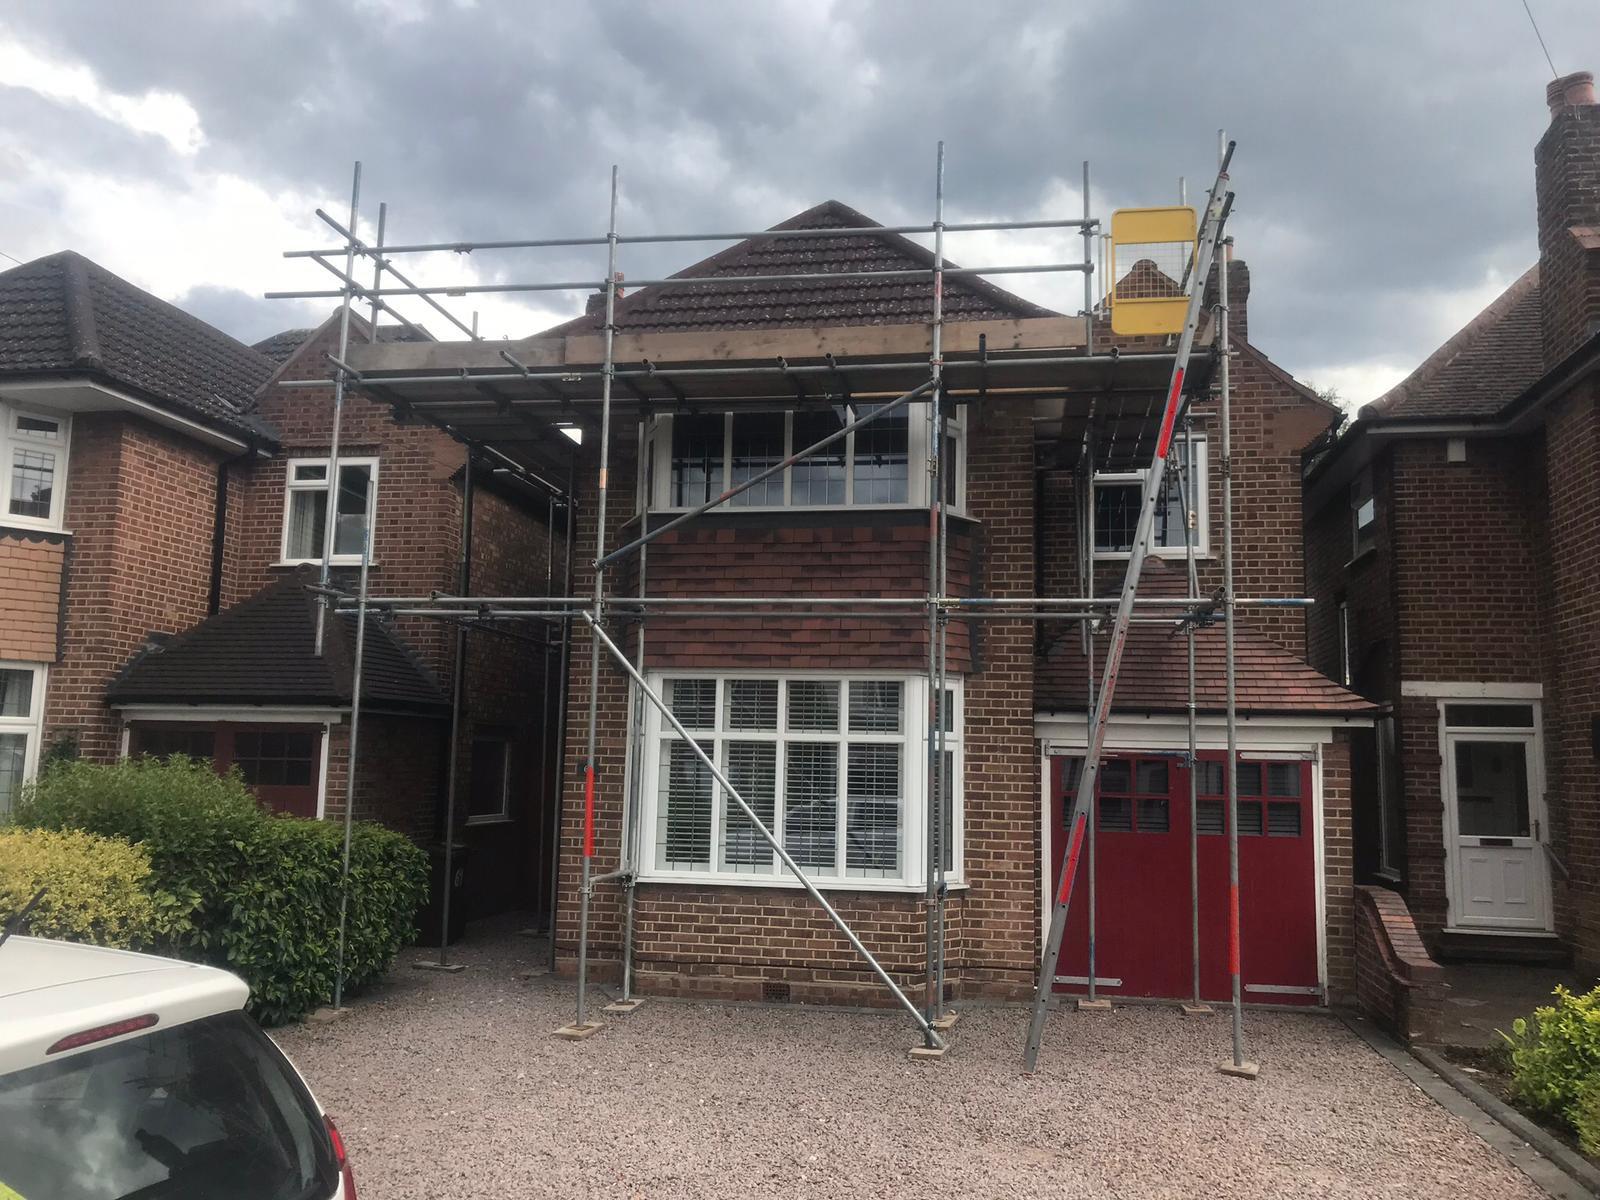 ajd scaffolding DOMESTIC SCAFFOLDING